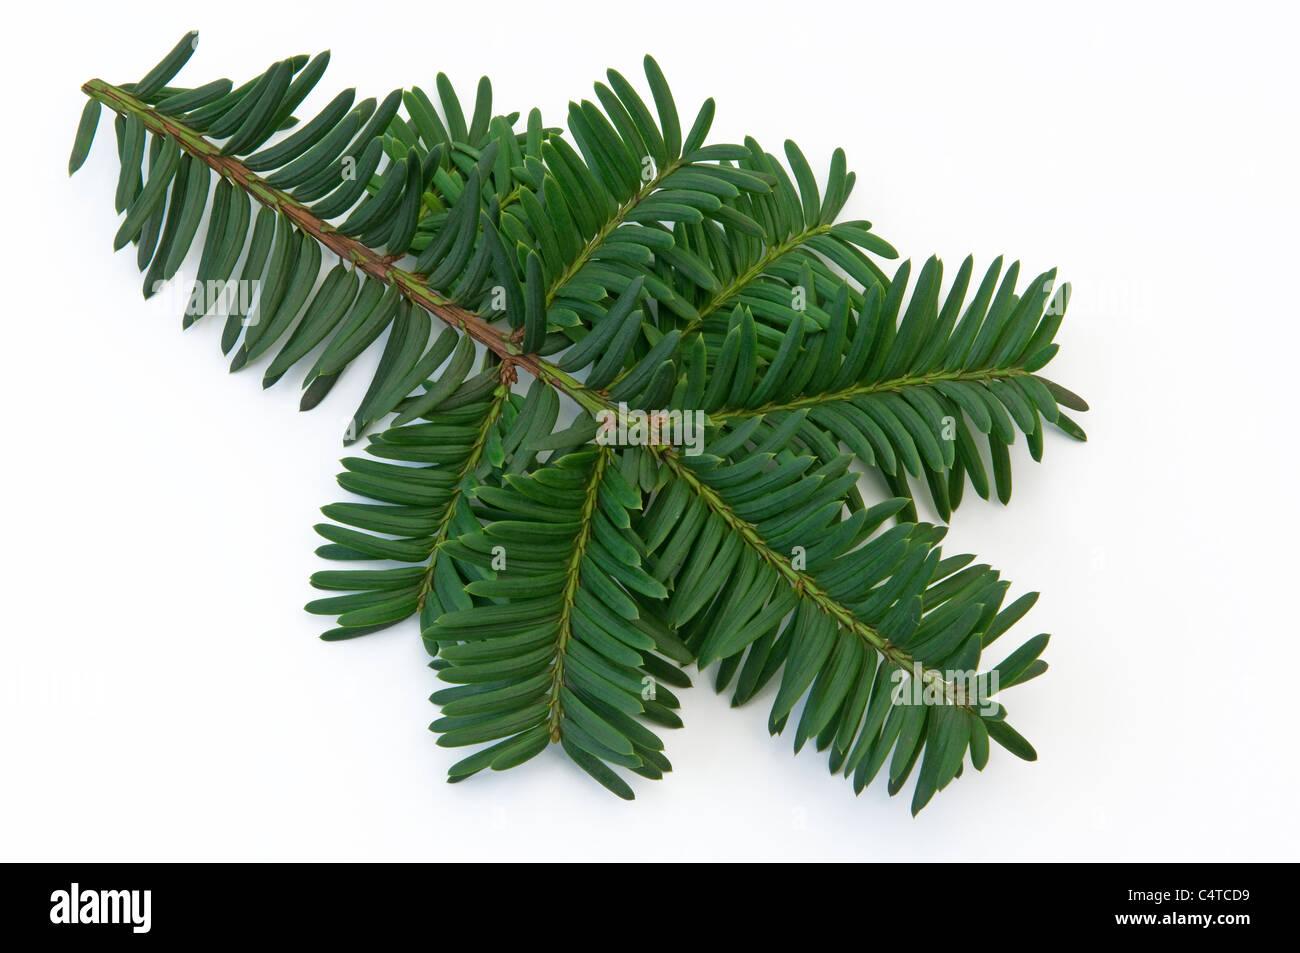 Yew (Taxus media Nidiformis), twig. Studio shot against a white background. - Stock Image